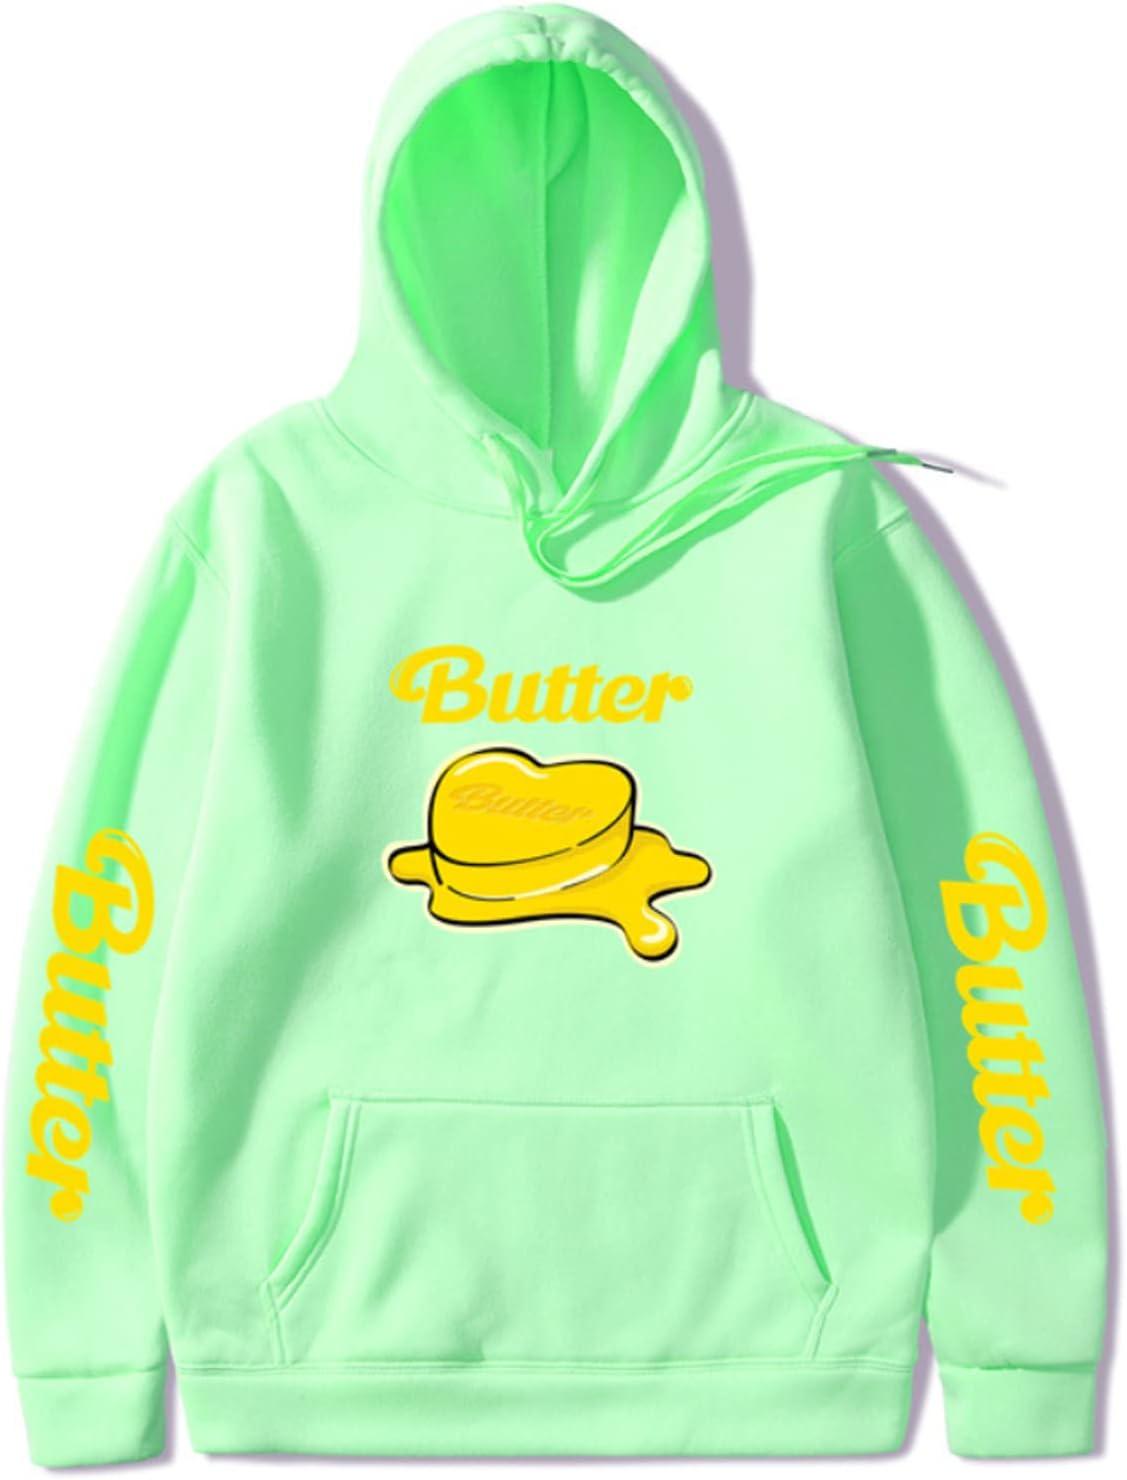 HIPOTUO Unisex Butter Hoodie BTS Jogger Sweatshirt Pullover Sportswear Light Green XX-Large